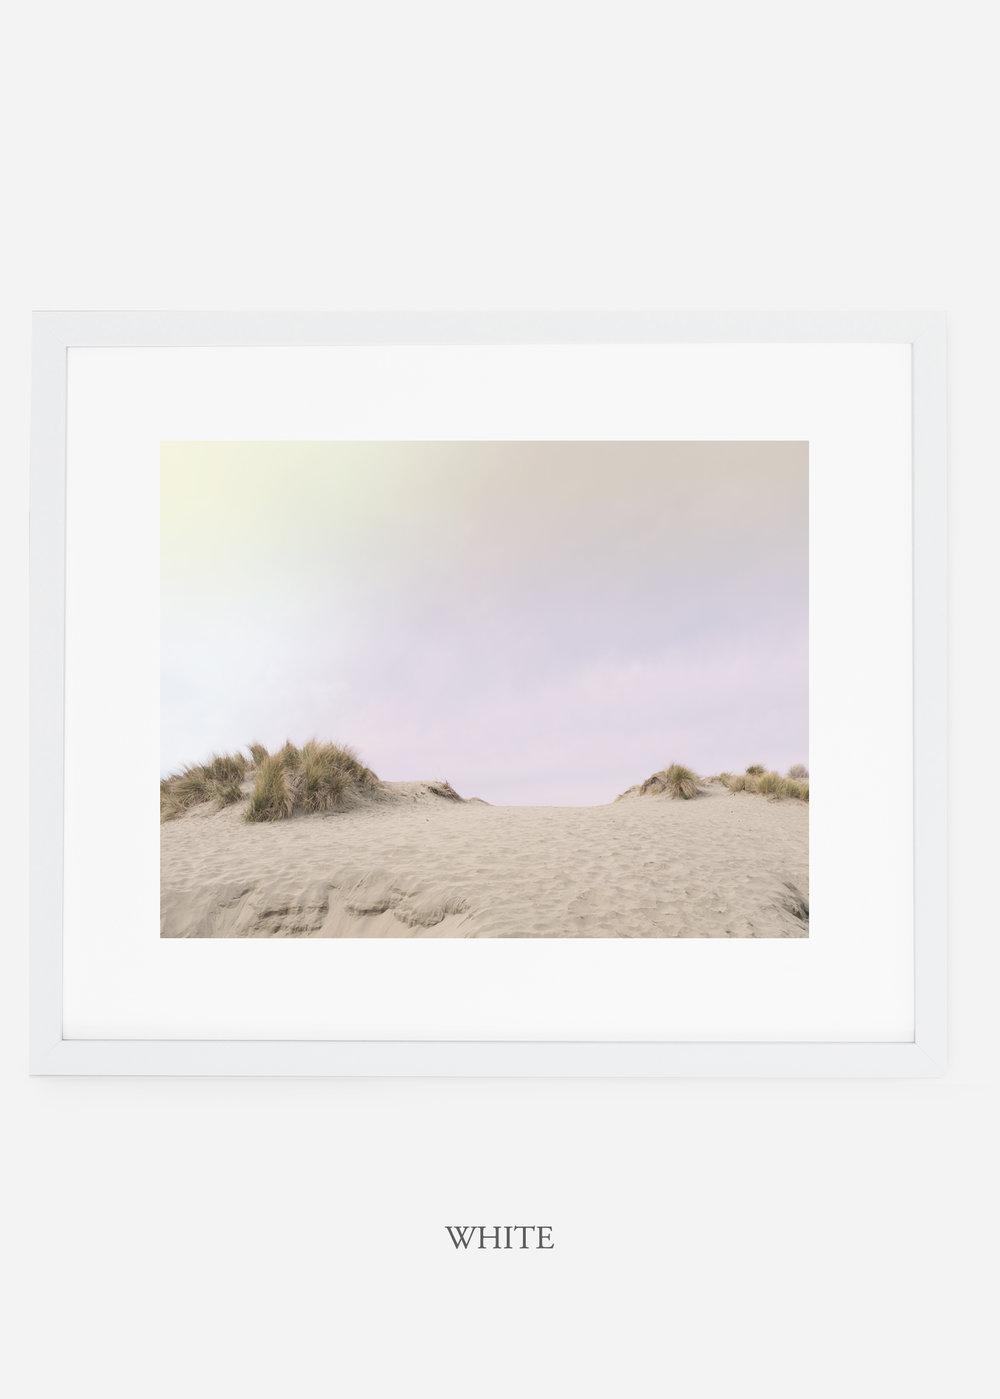 WilderCalifornia_whiteframe_interiordesign_oceanprint_DunesNo.1.jpg